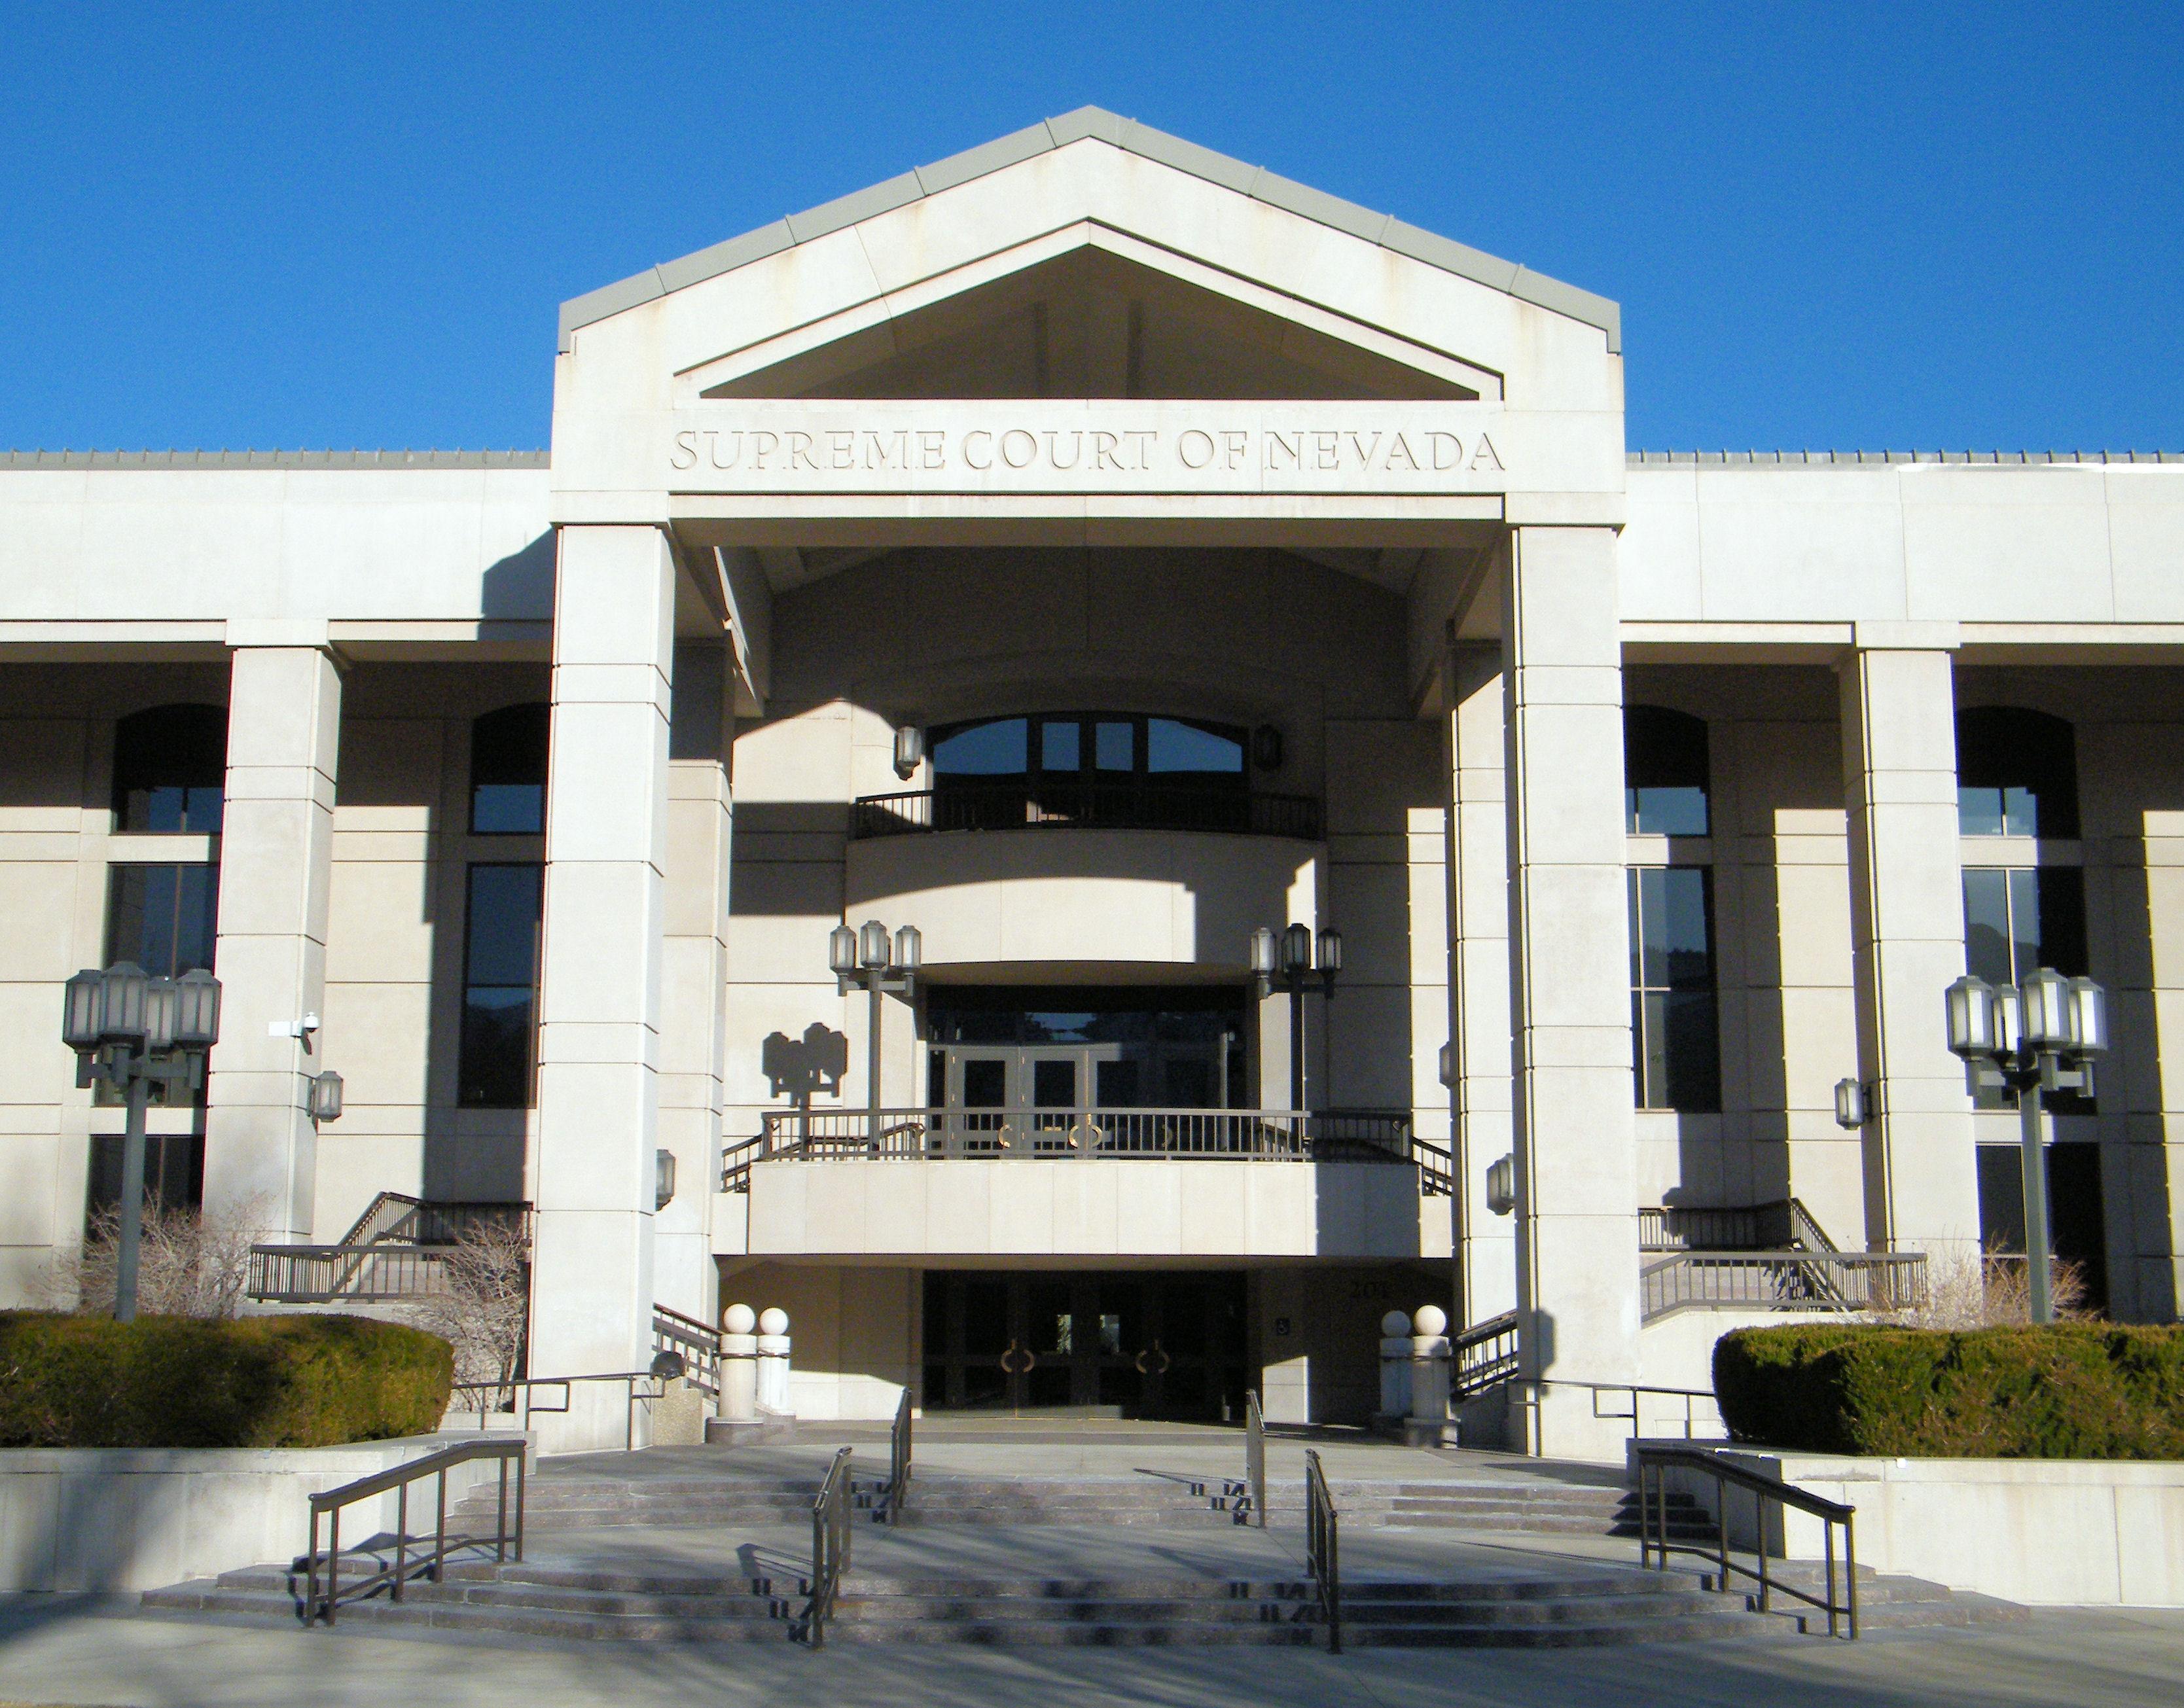 Supreme Court of Nevada building